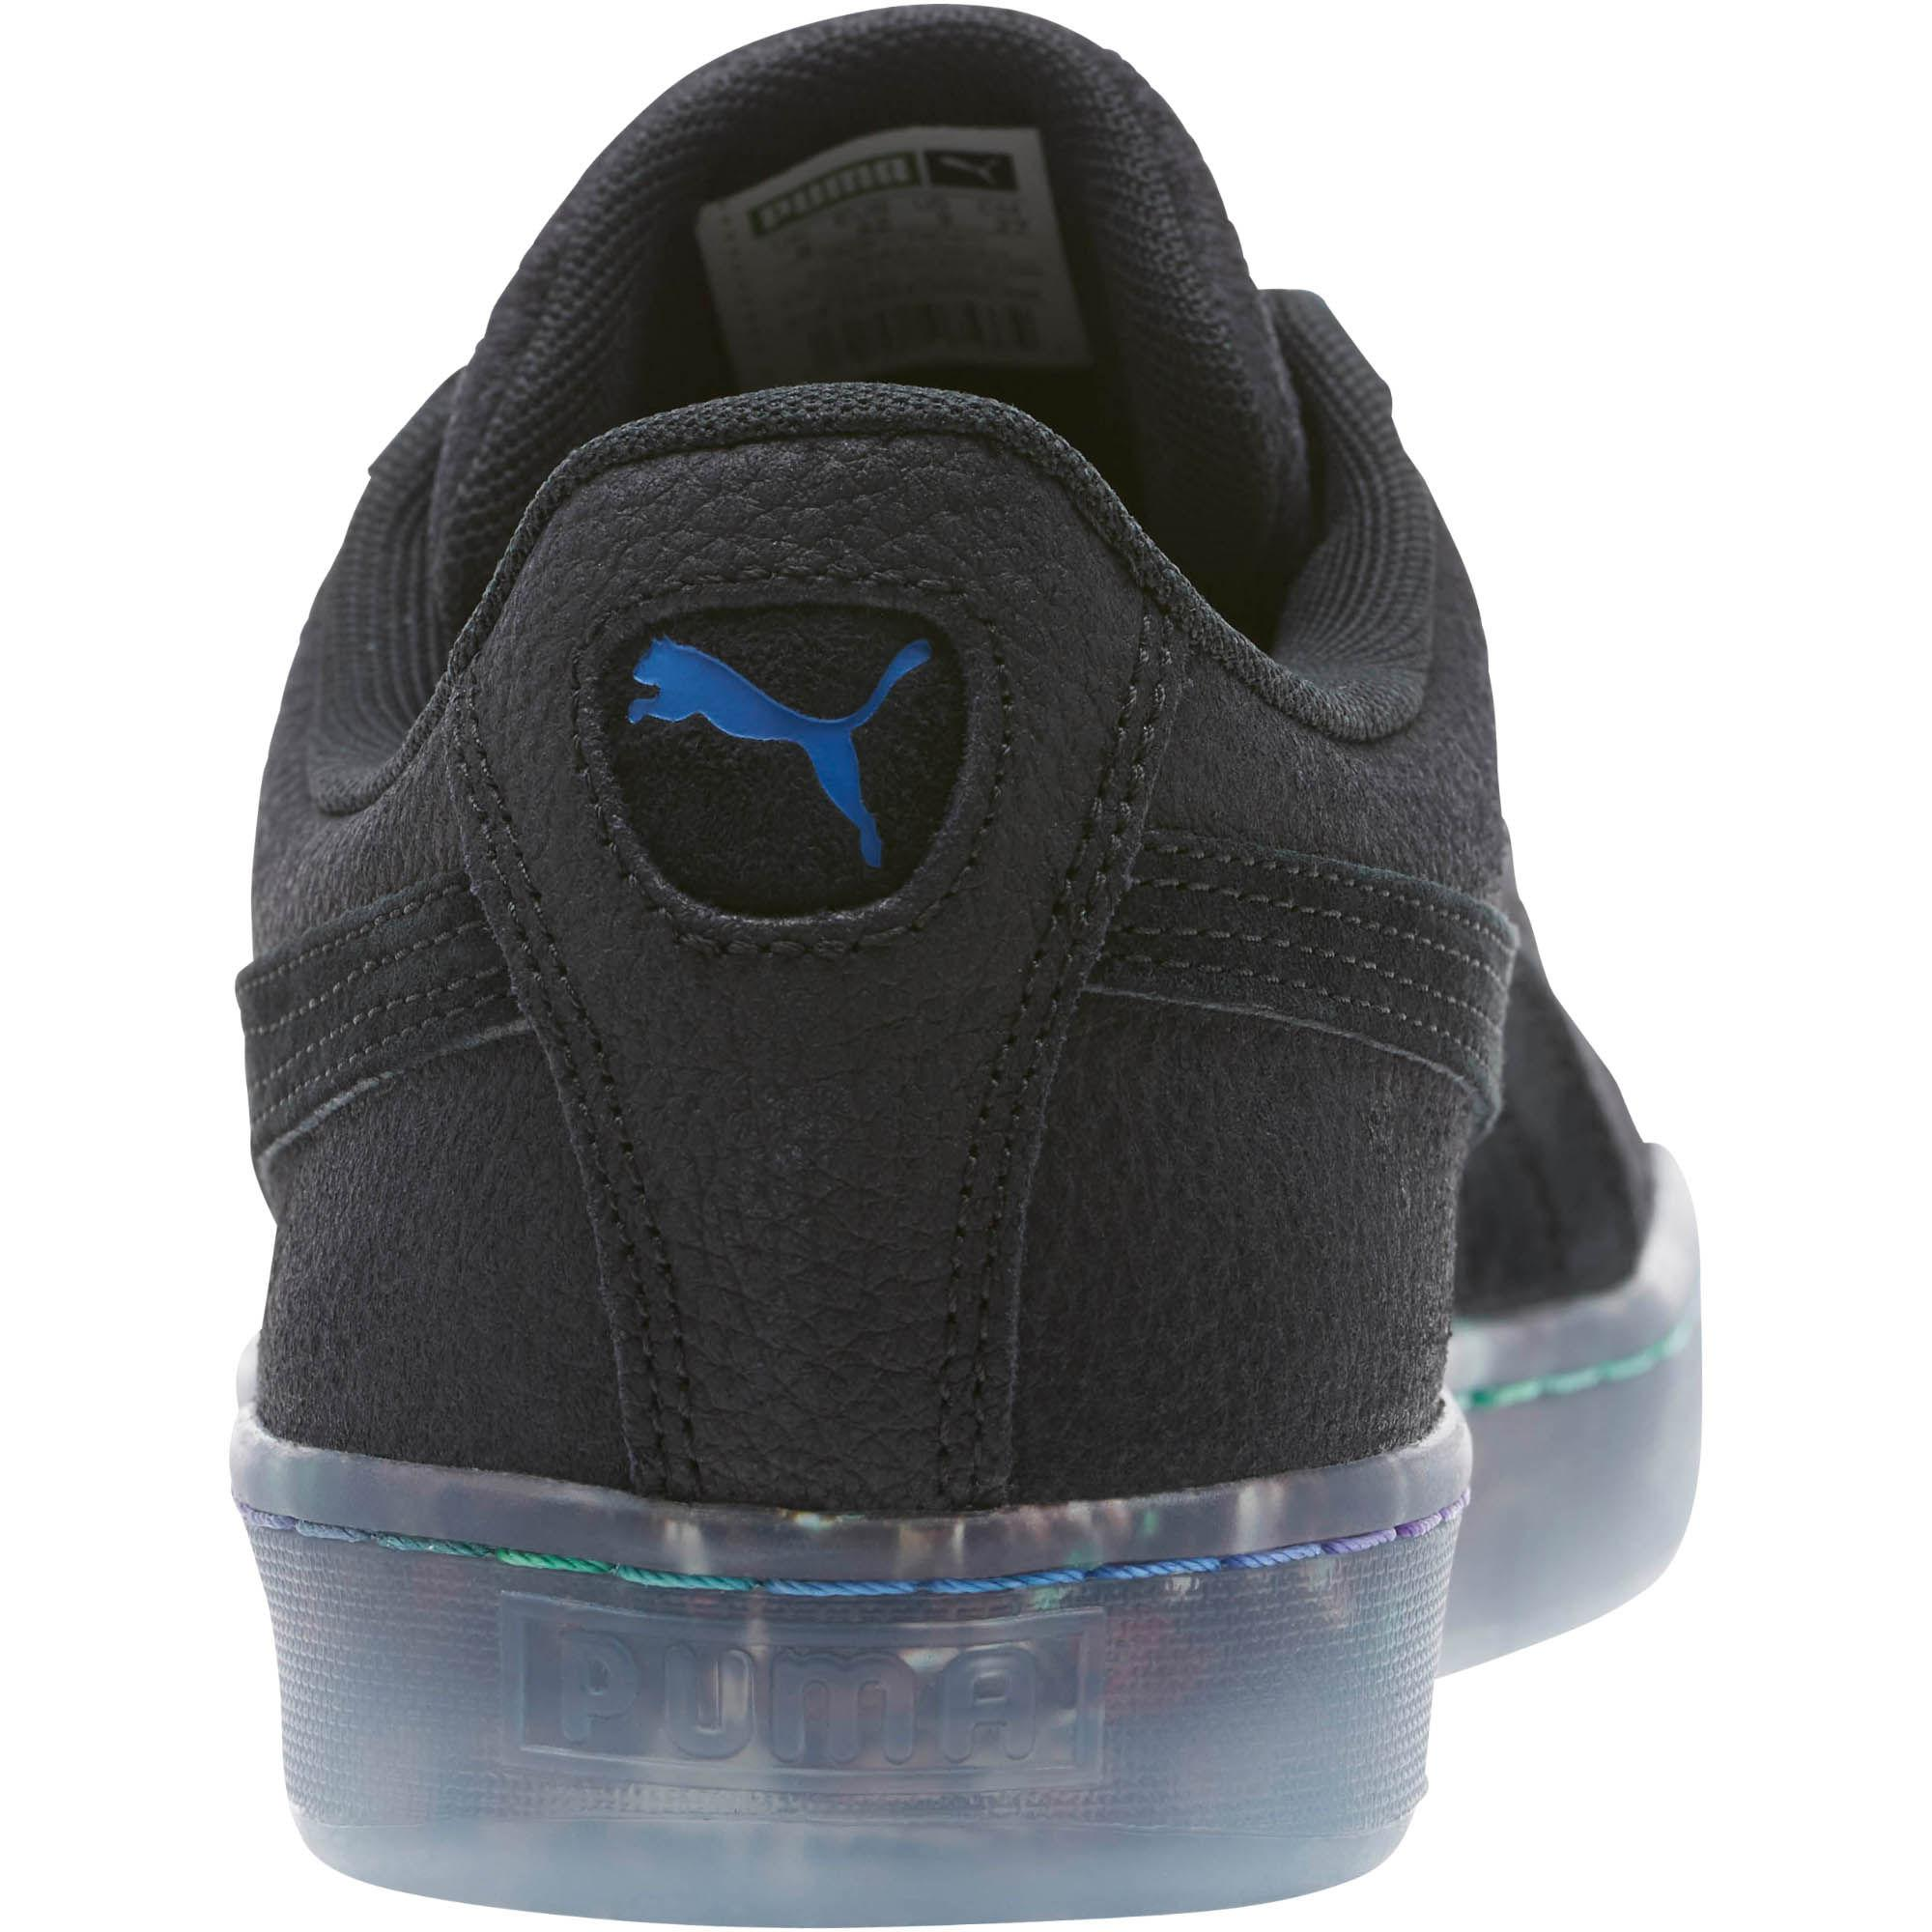 new concept 56cc4 4385d PUMA Multicolor Suede Classic V2 Aop Men's Sneakers for men